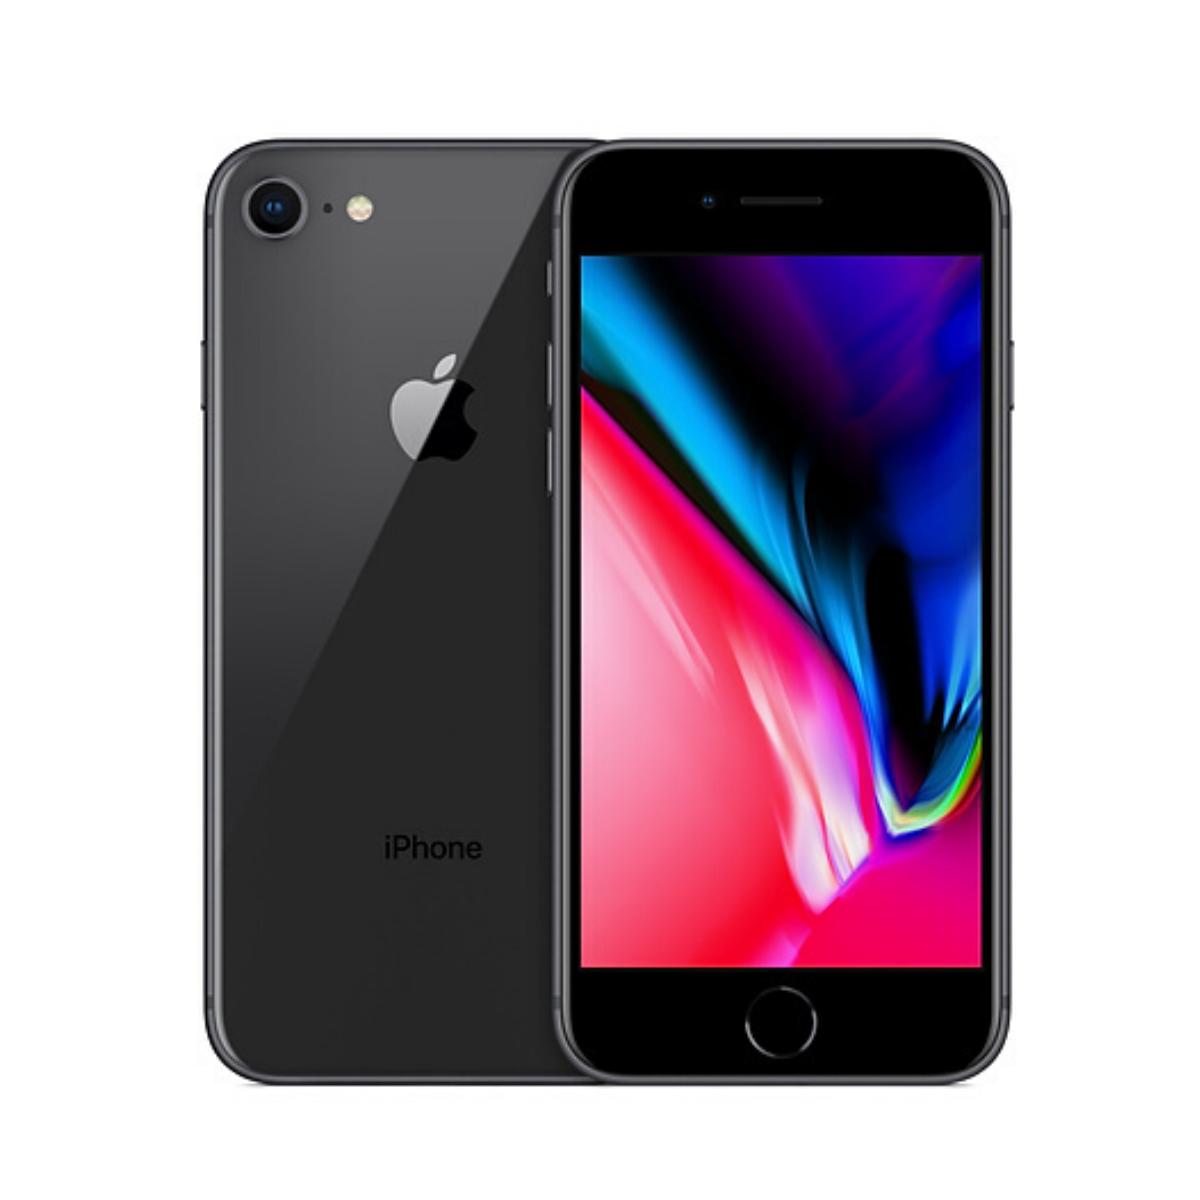 Sim Free iPhone 8 64GB Unlocked Mobile Phone - Space Grey